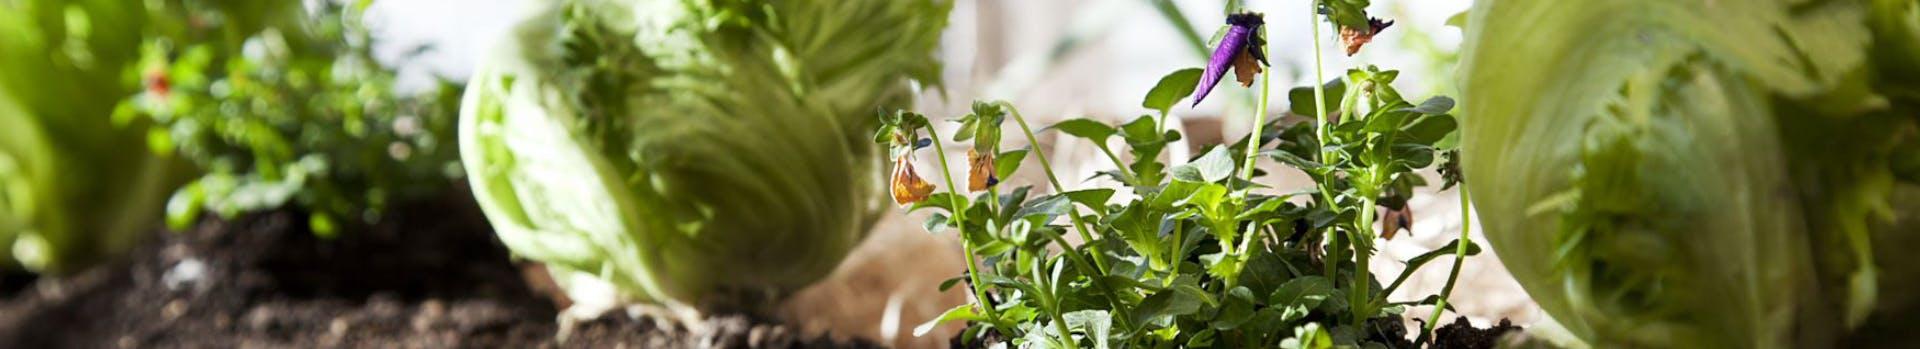 Verdure nell'orto